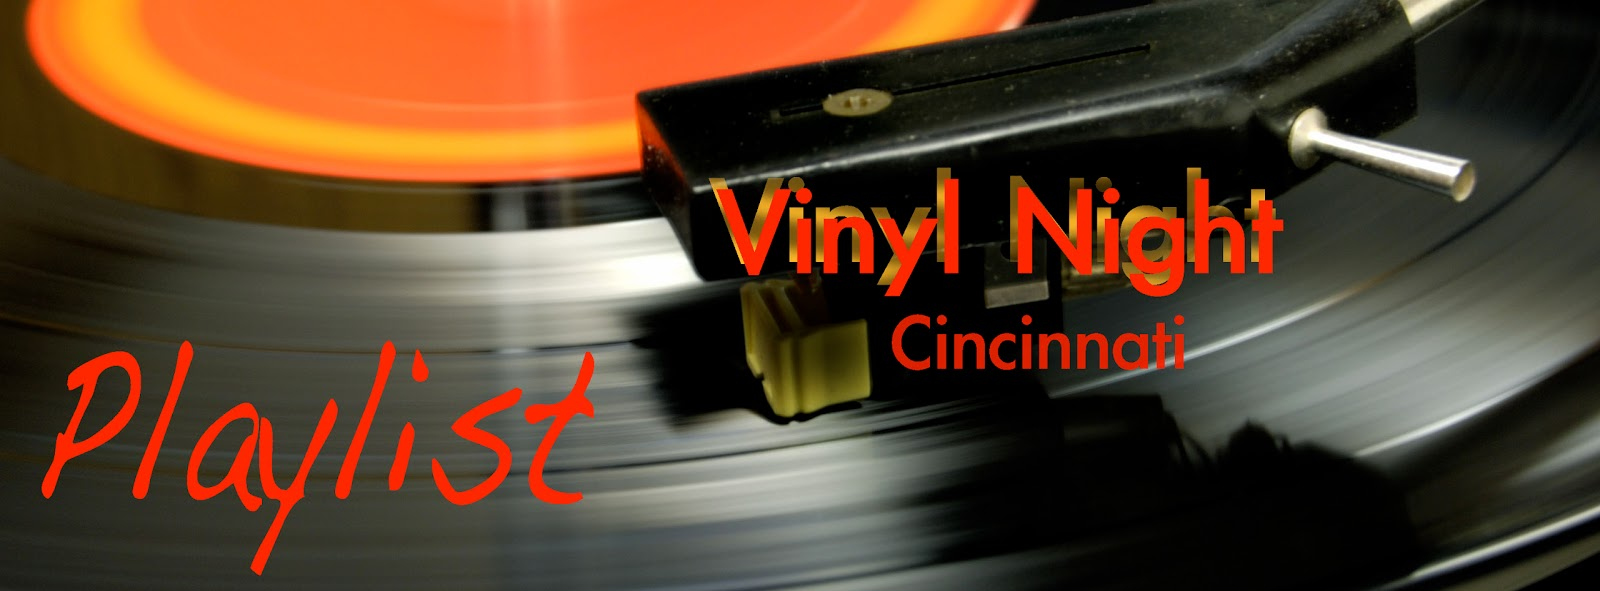 Vinyl Night Cincinnati